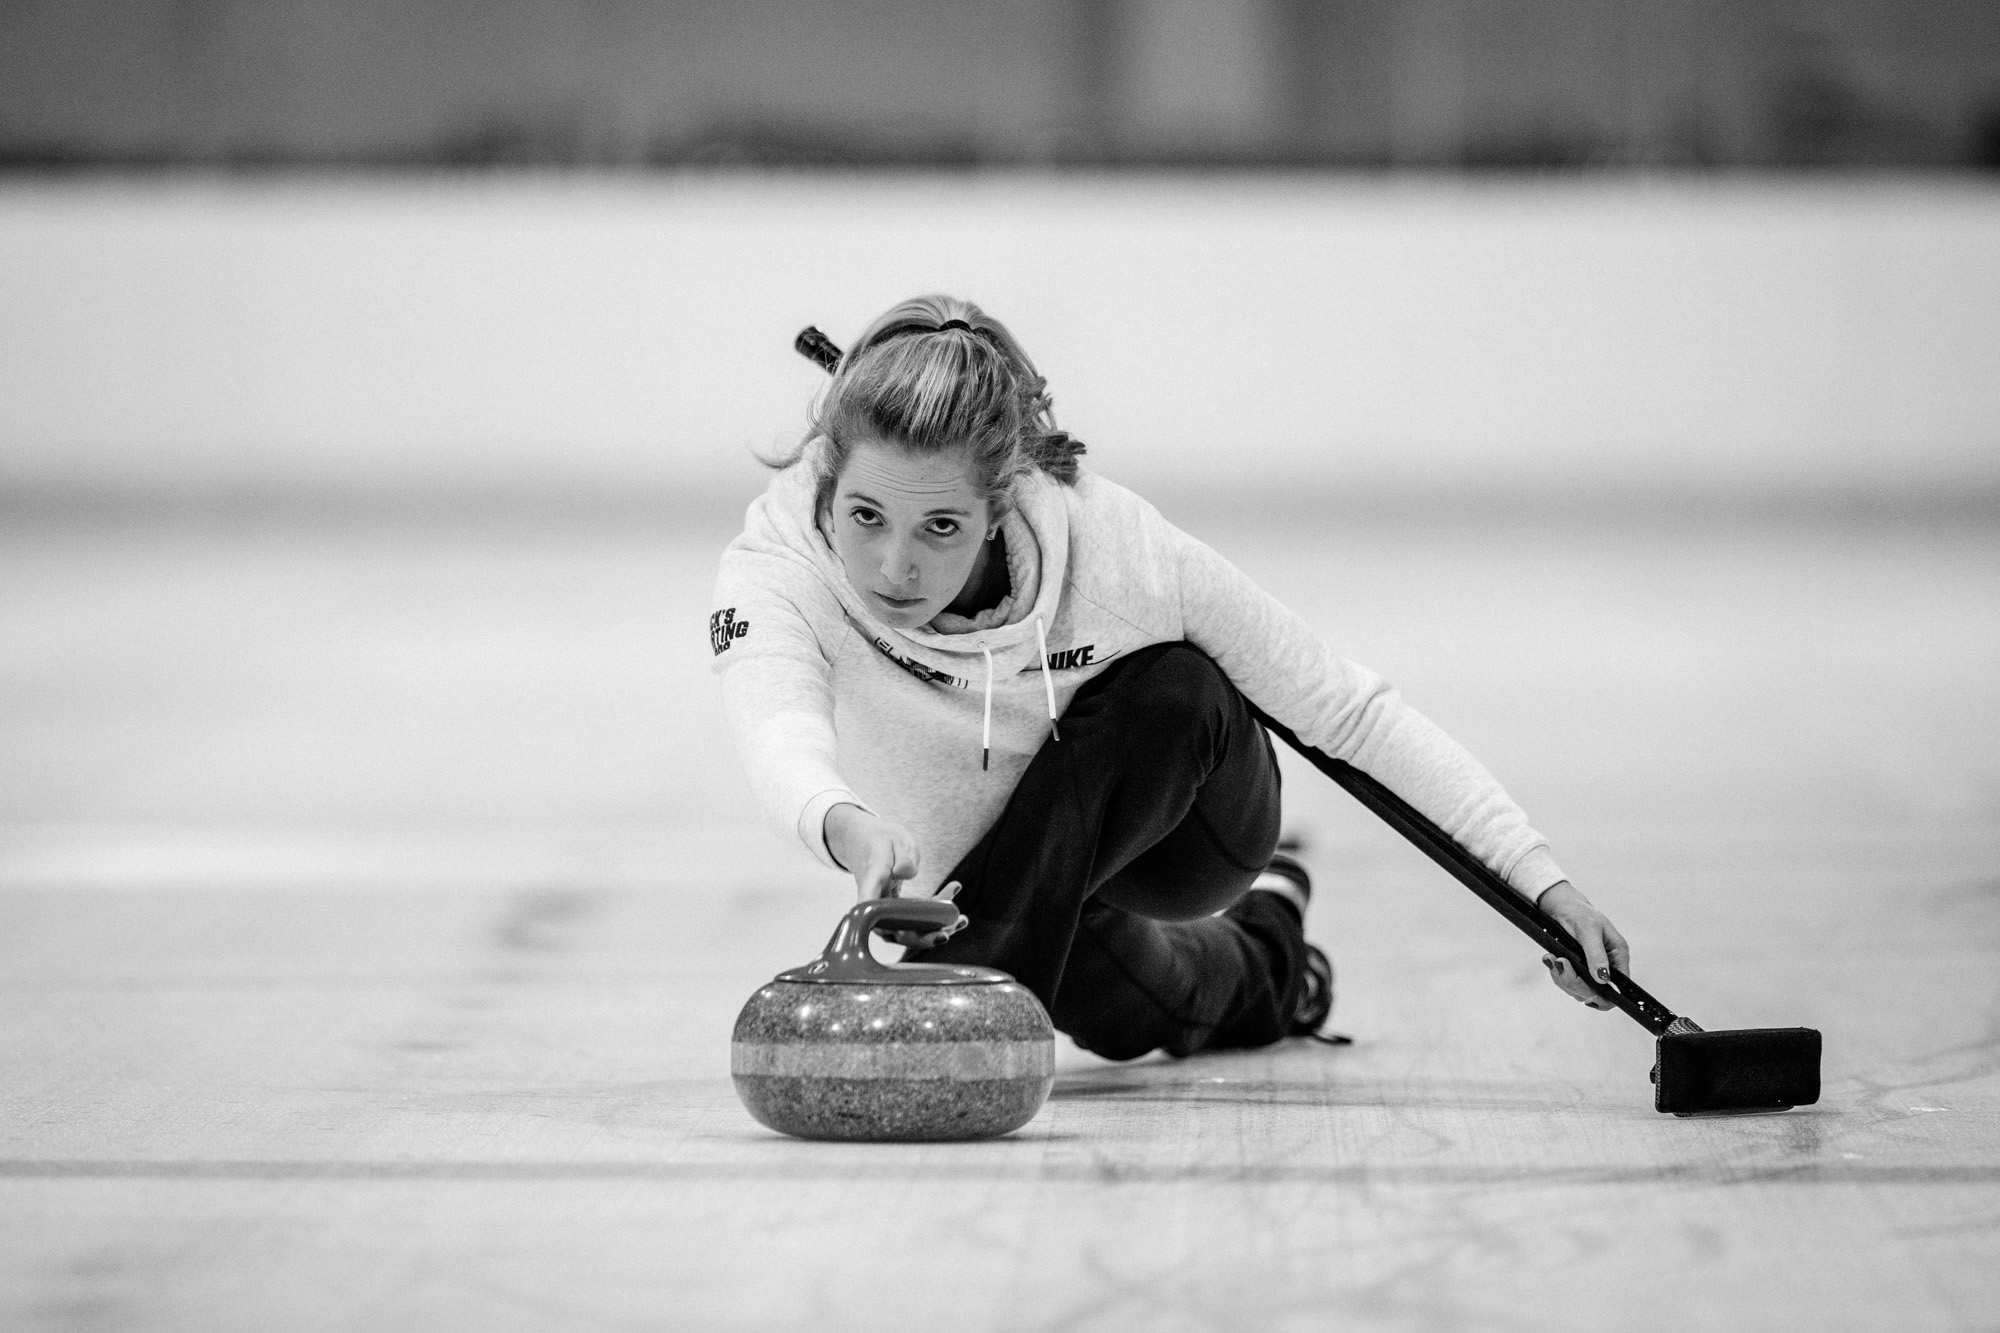 20170427_DSGContender_Curling 1980 1_441.jpg